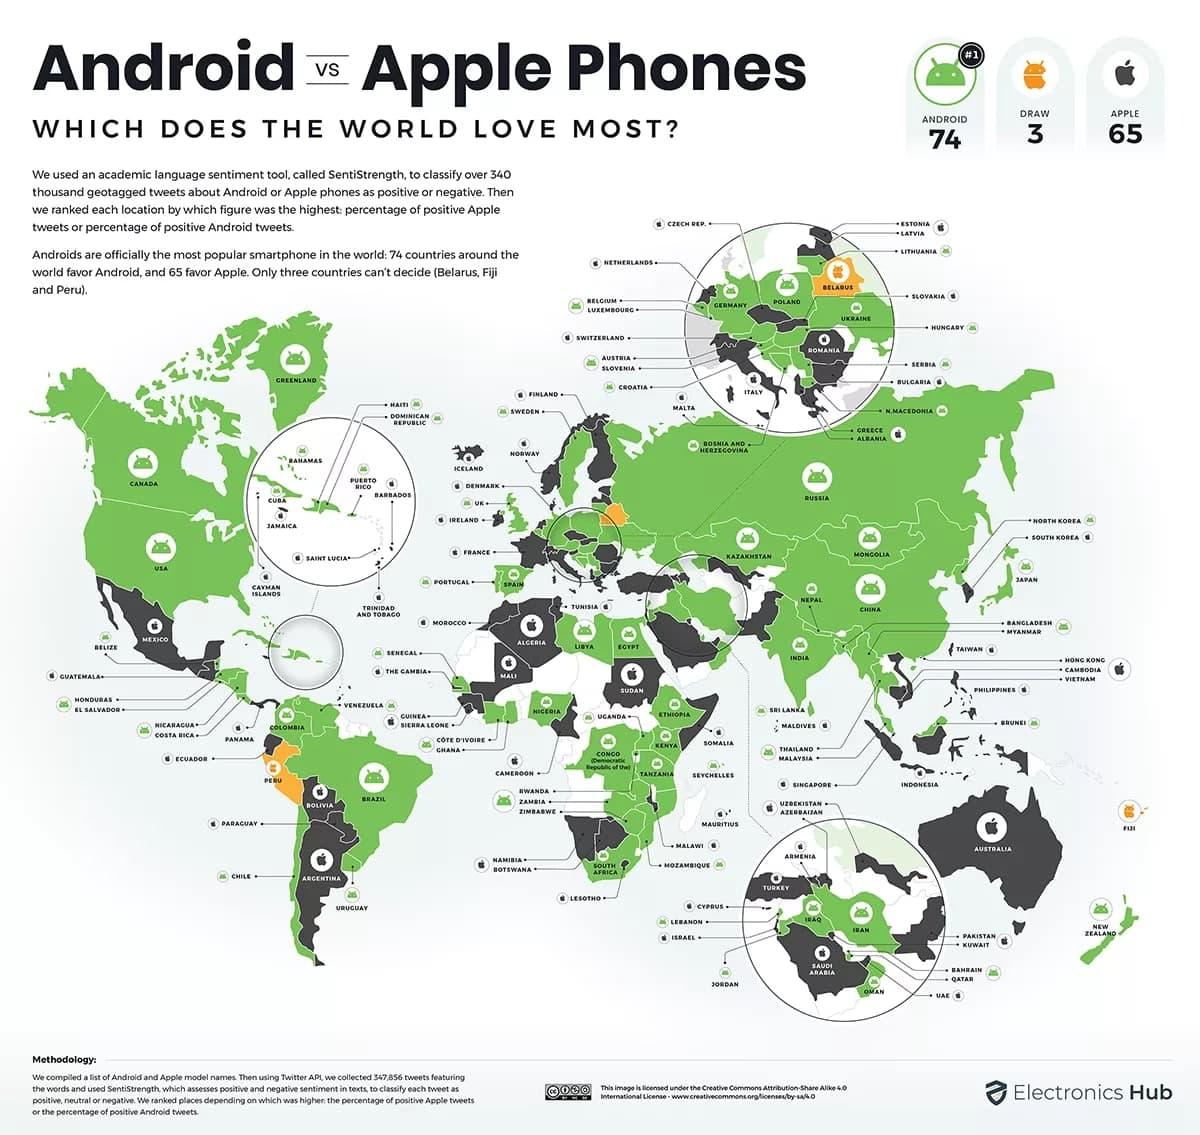 Android 赢得全球手机之战